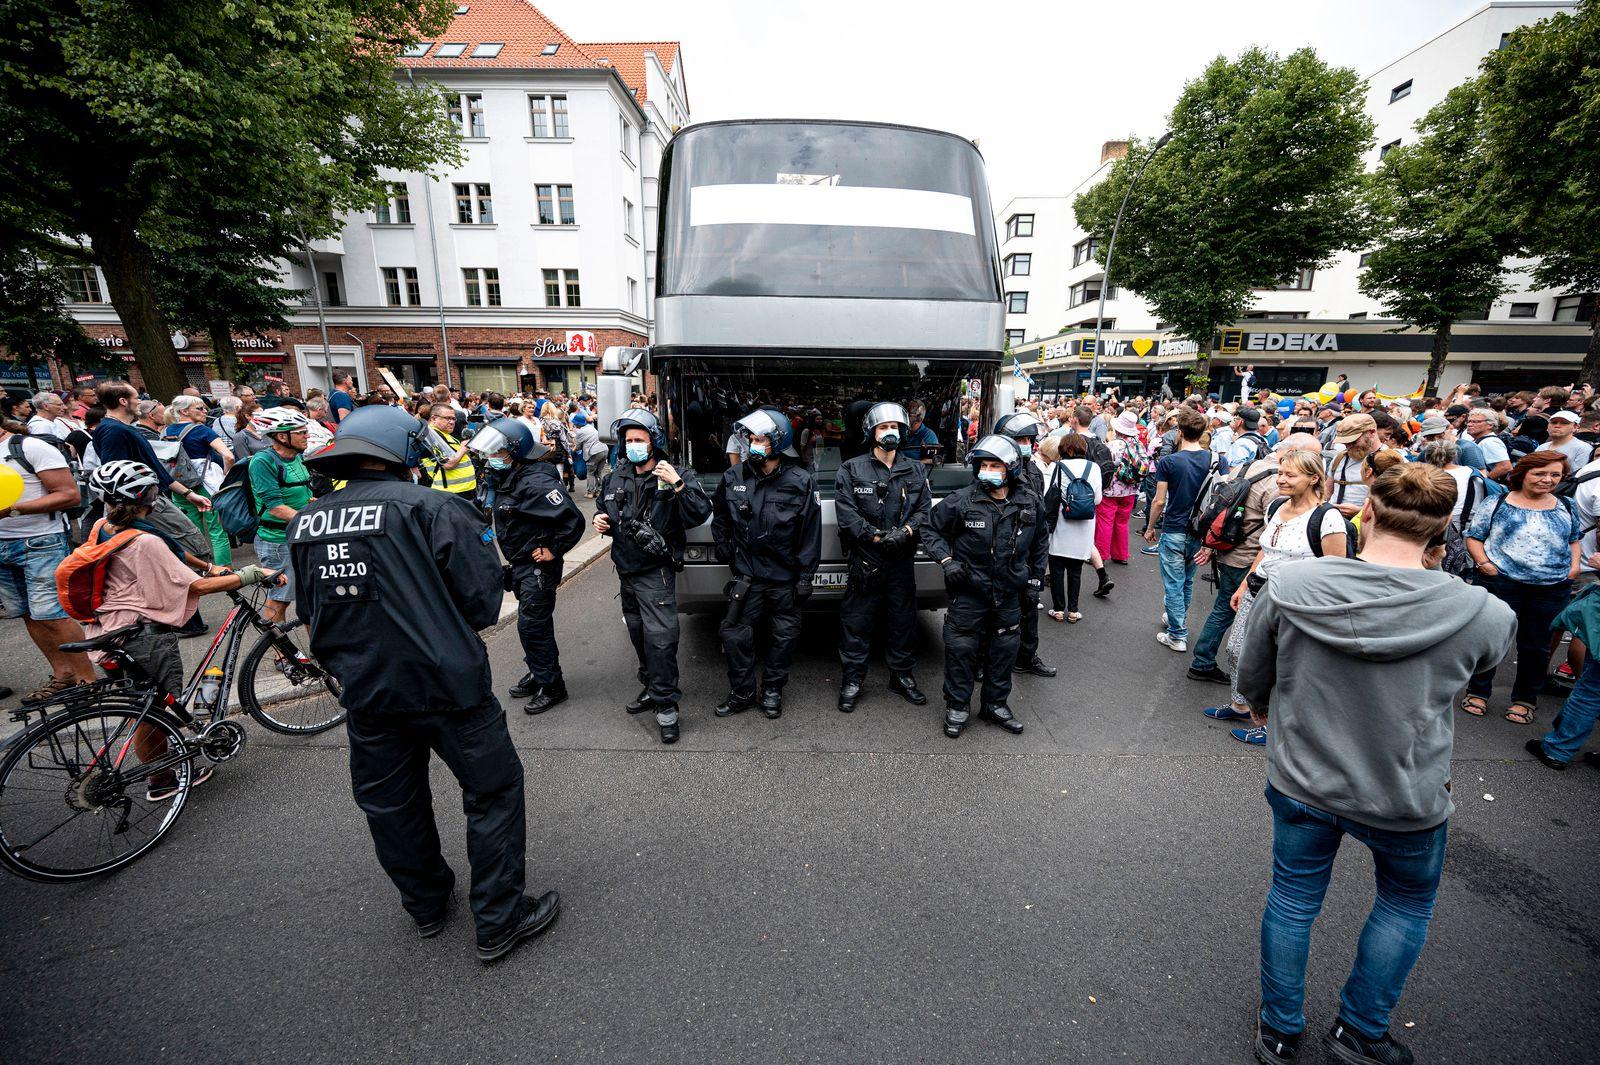 Demonstrationsverbot in Berlin - Polizei